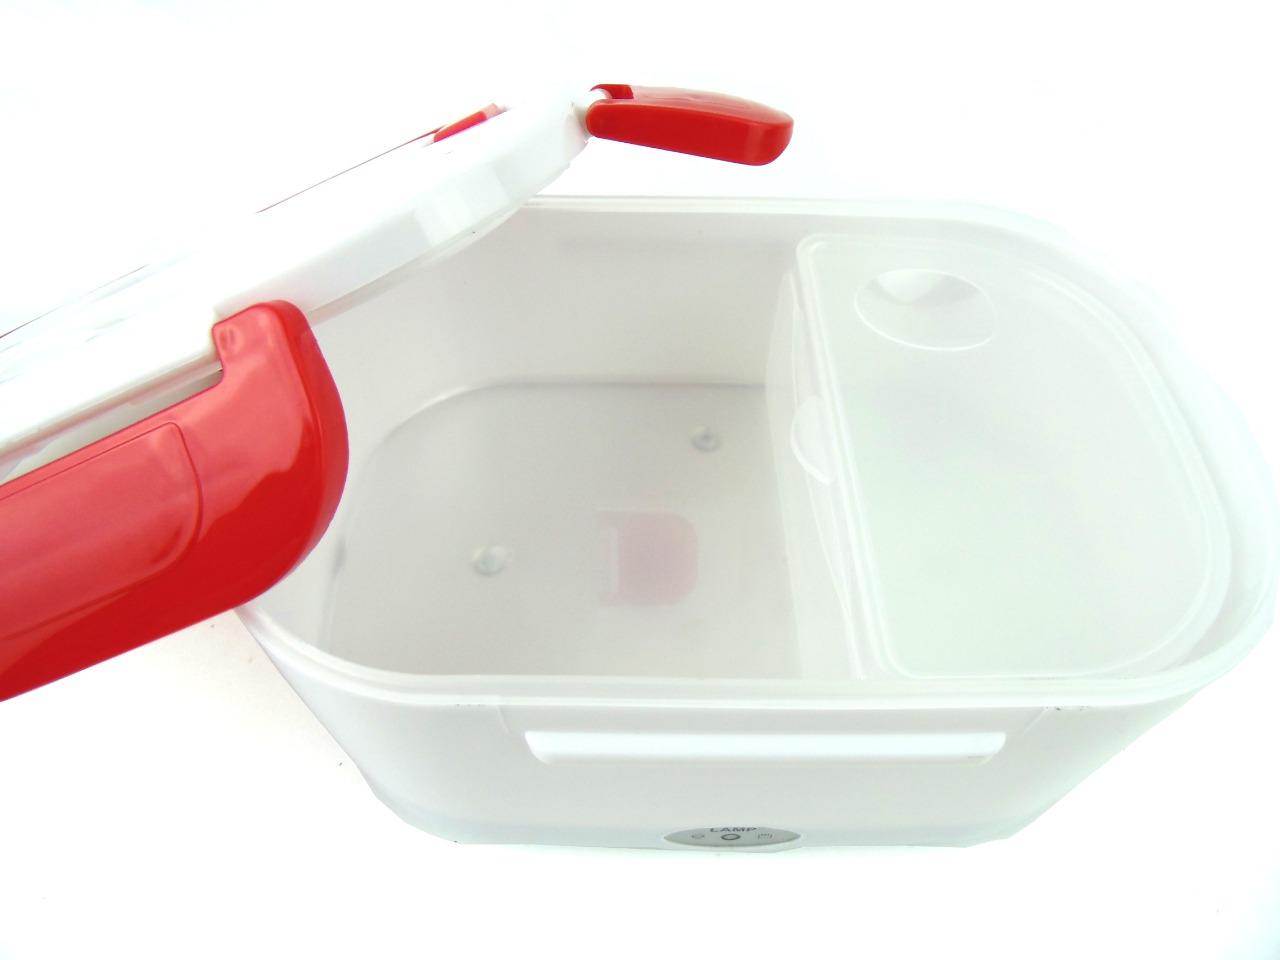 Electric Lunch box حافظة كهربائية لحفظ وتسخين الوجبات